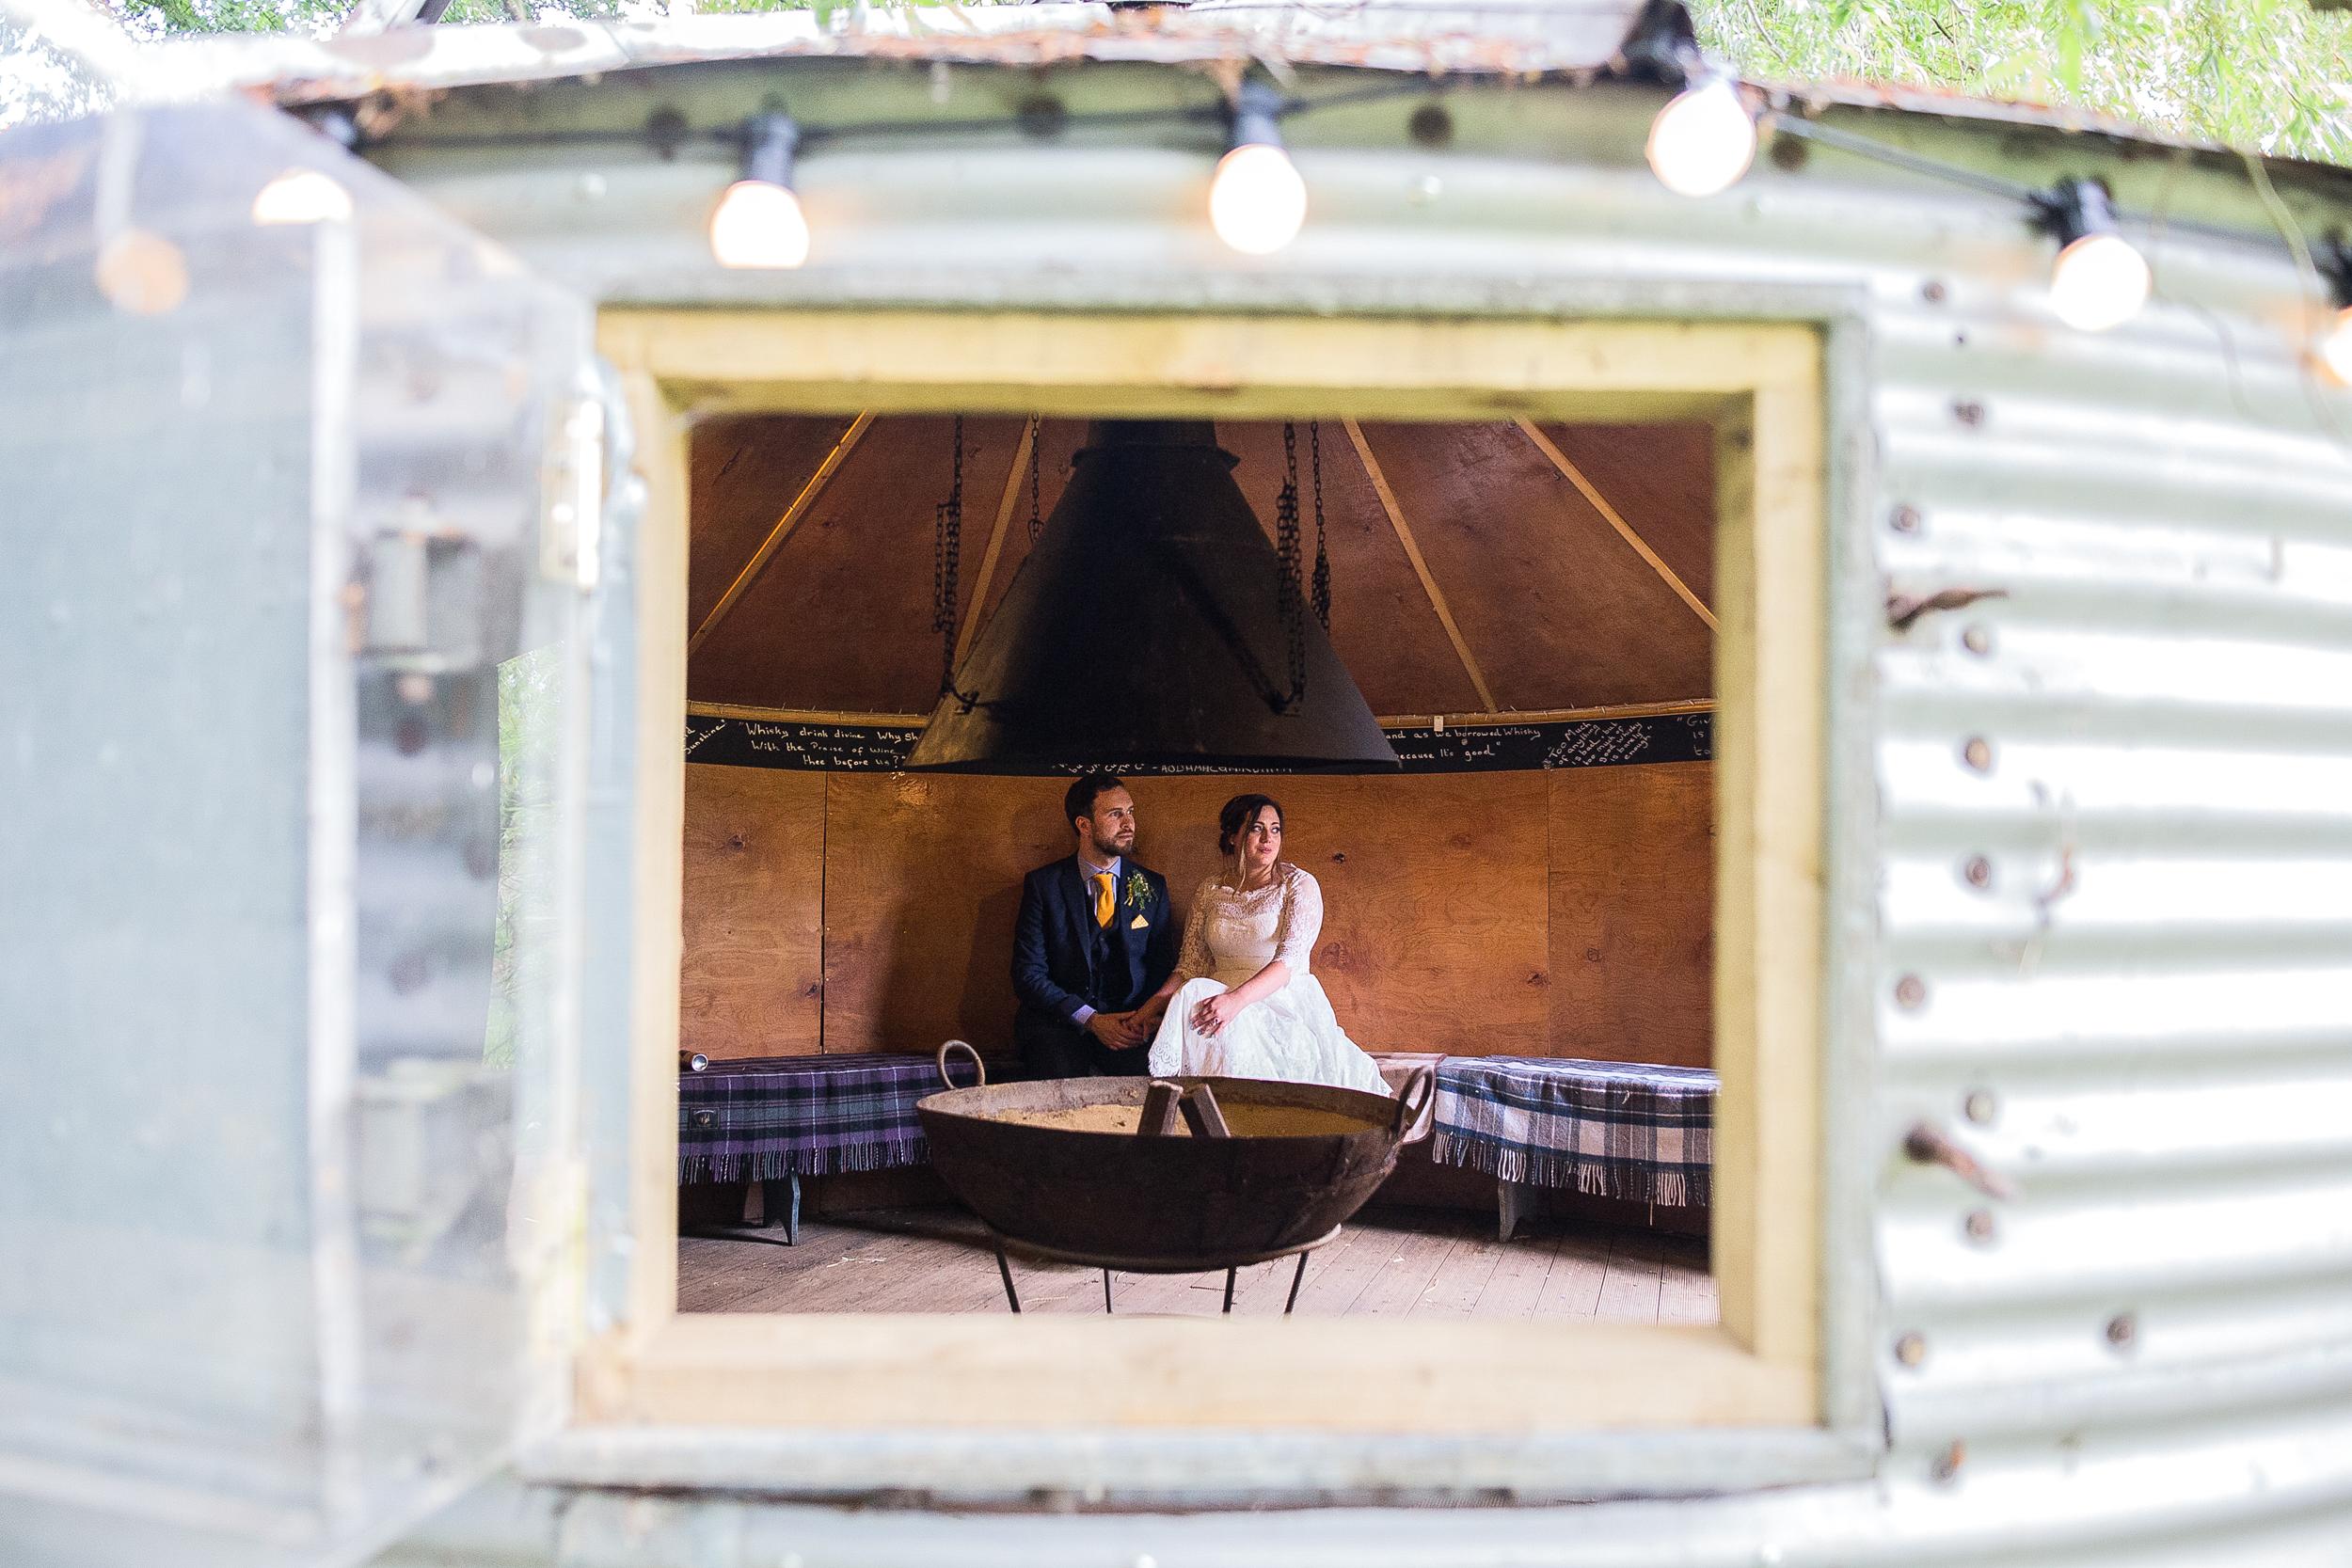 creative-wedding-photography-teesside-north-east-yorkshire-2.jpg